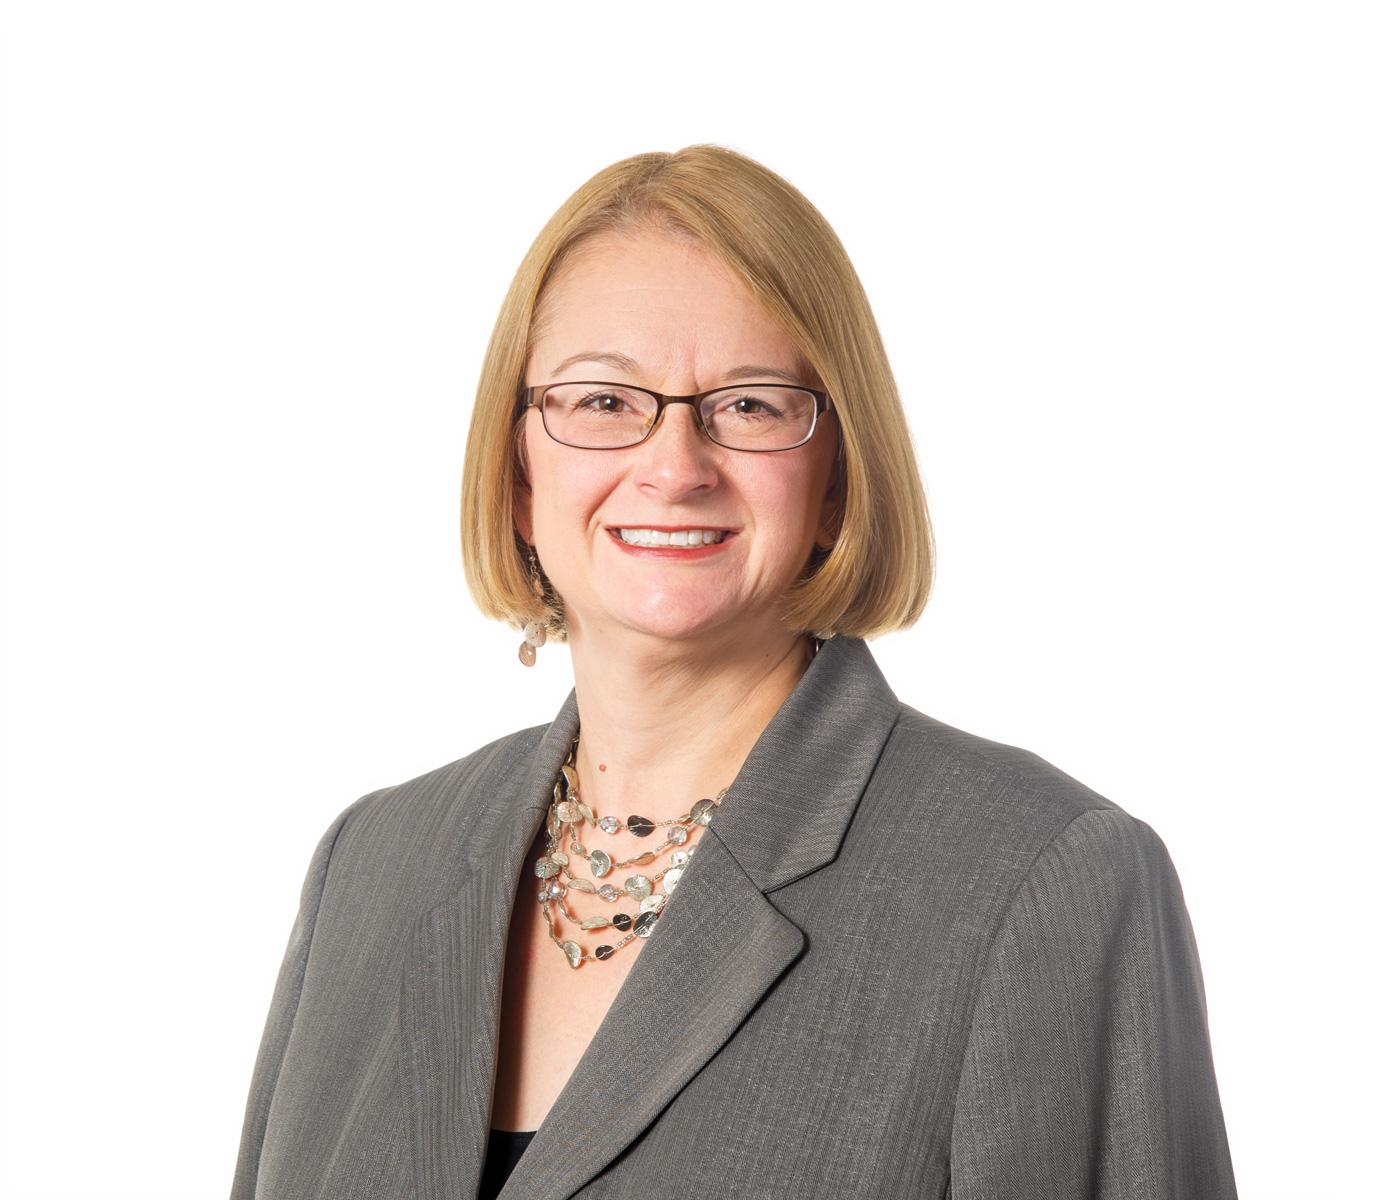 Christina Peer